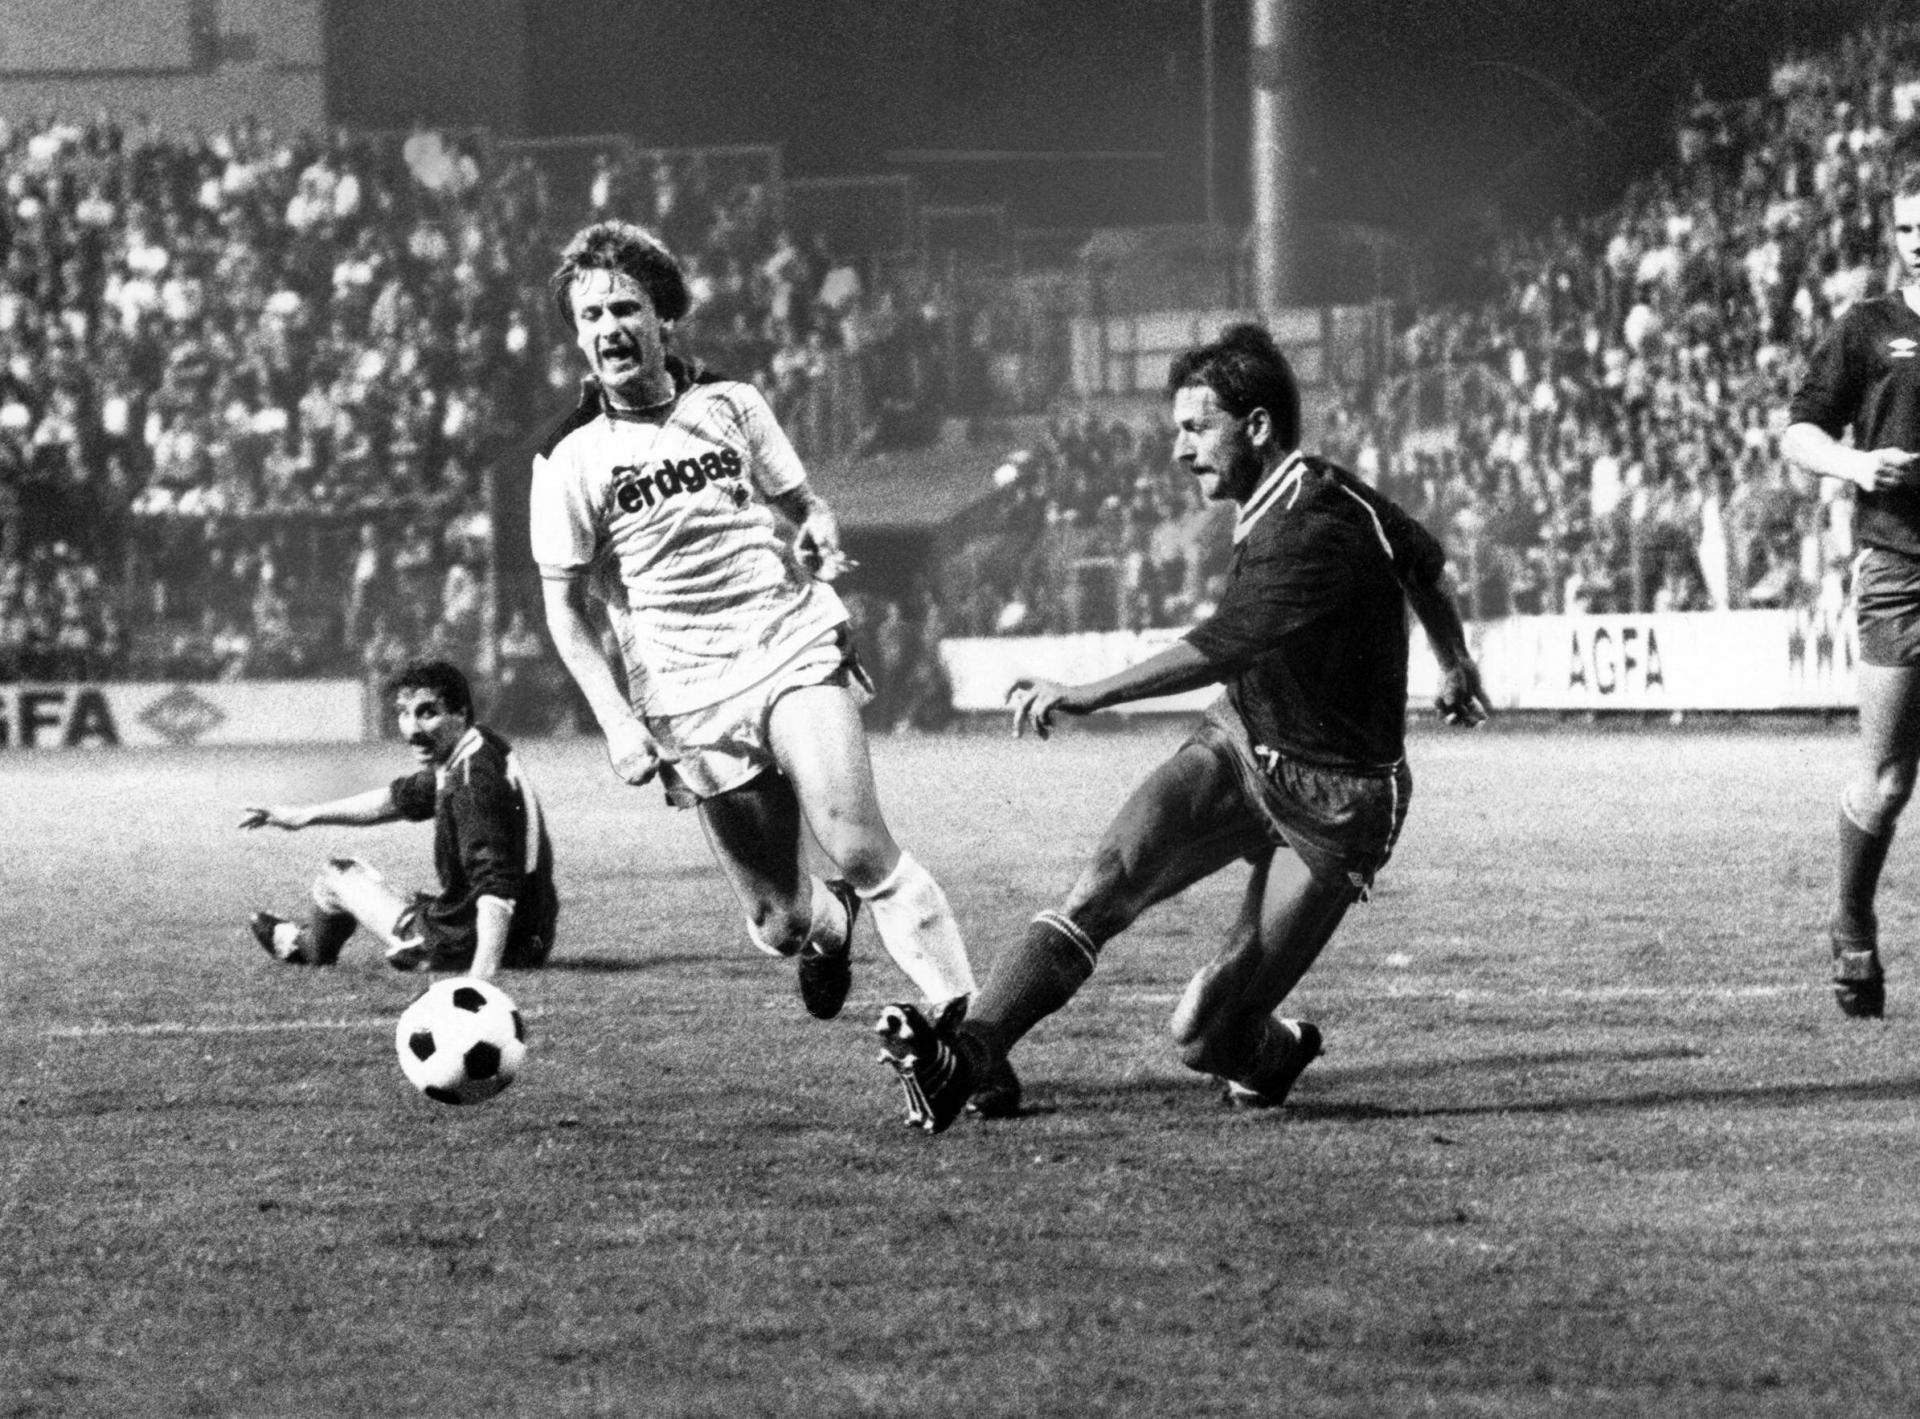 Borussia Mönchengladbach – Lech Poznań 1:1 (18.09.1985)